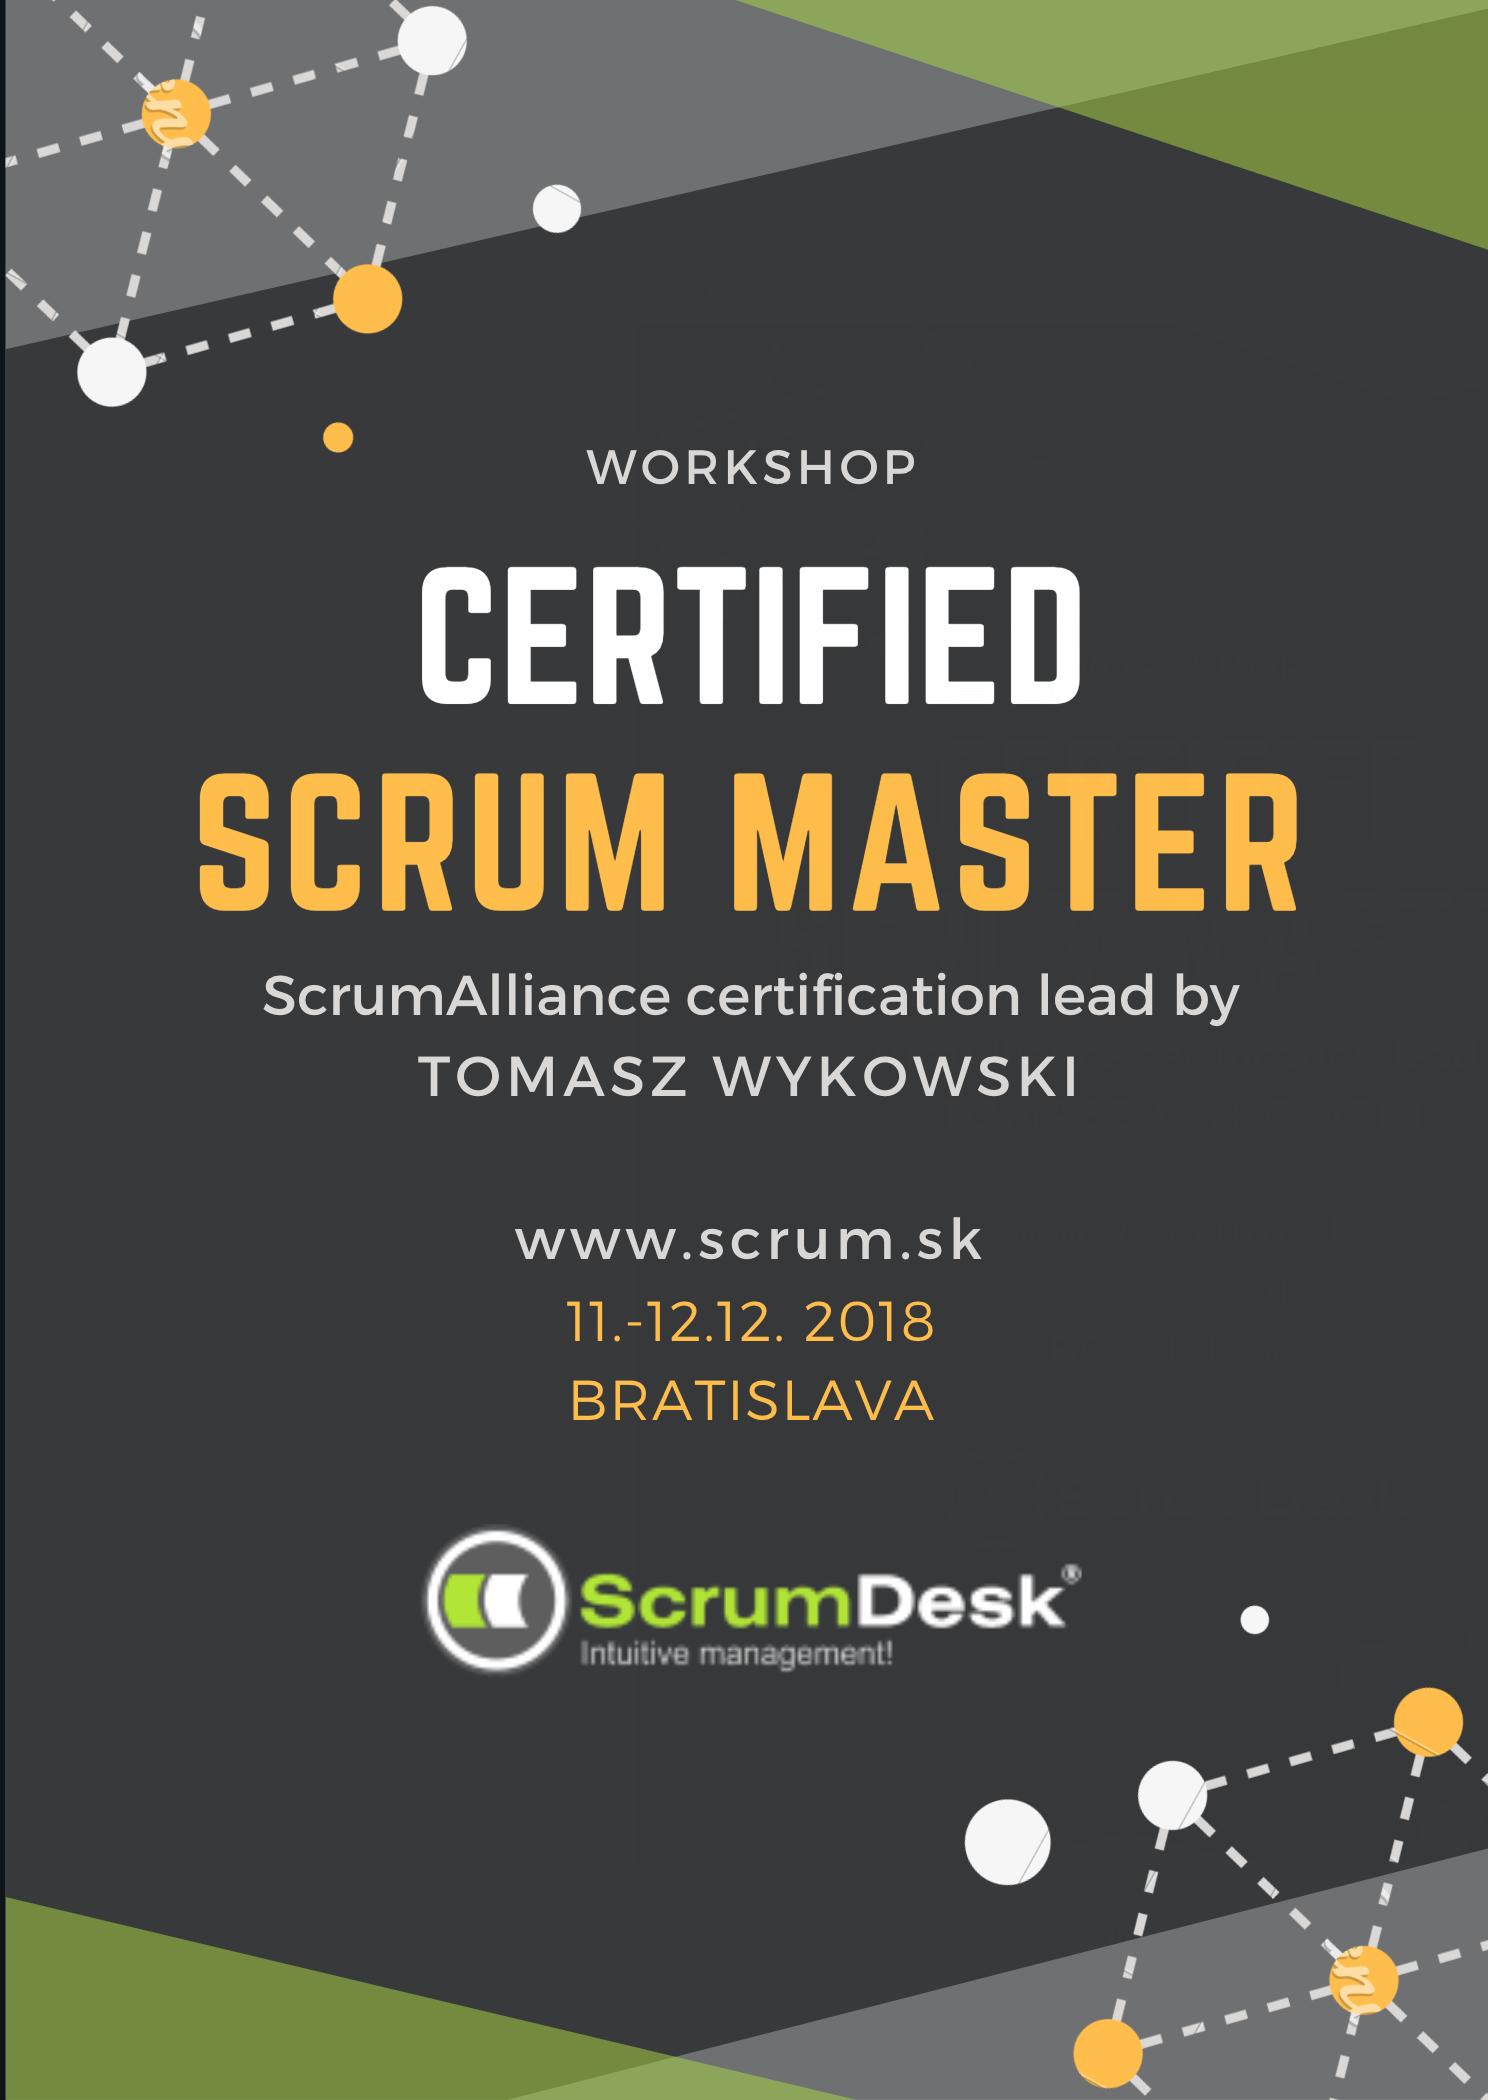 Certified Scrummaster Course December 11 12 2018 Bratislava